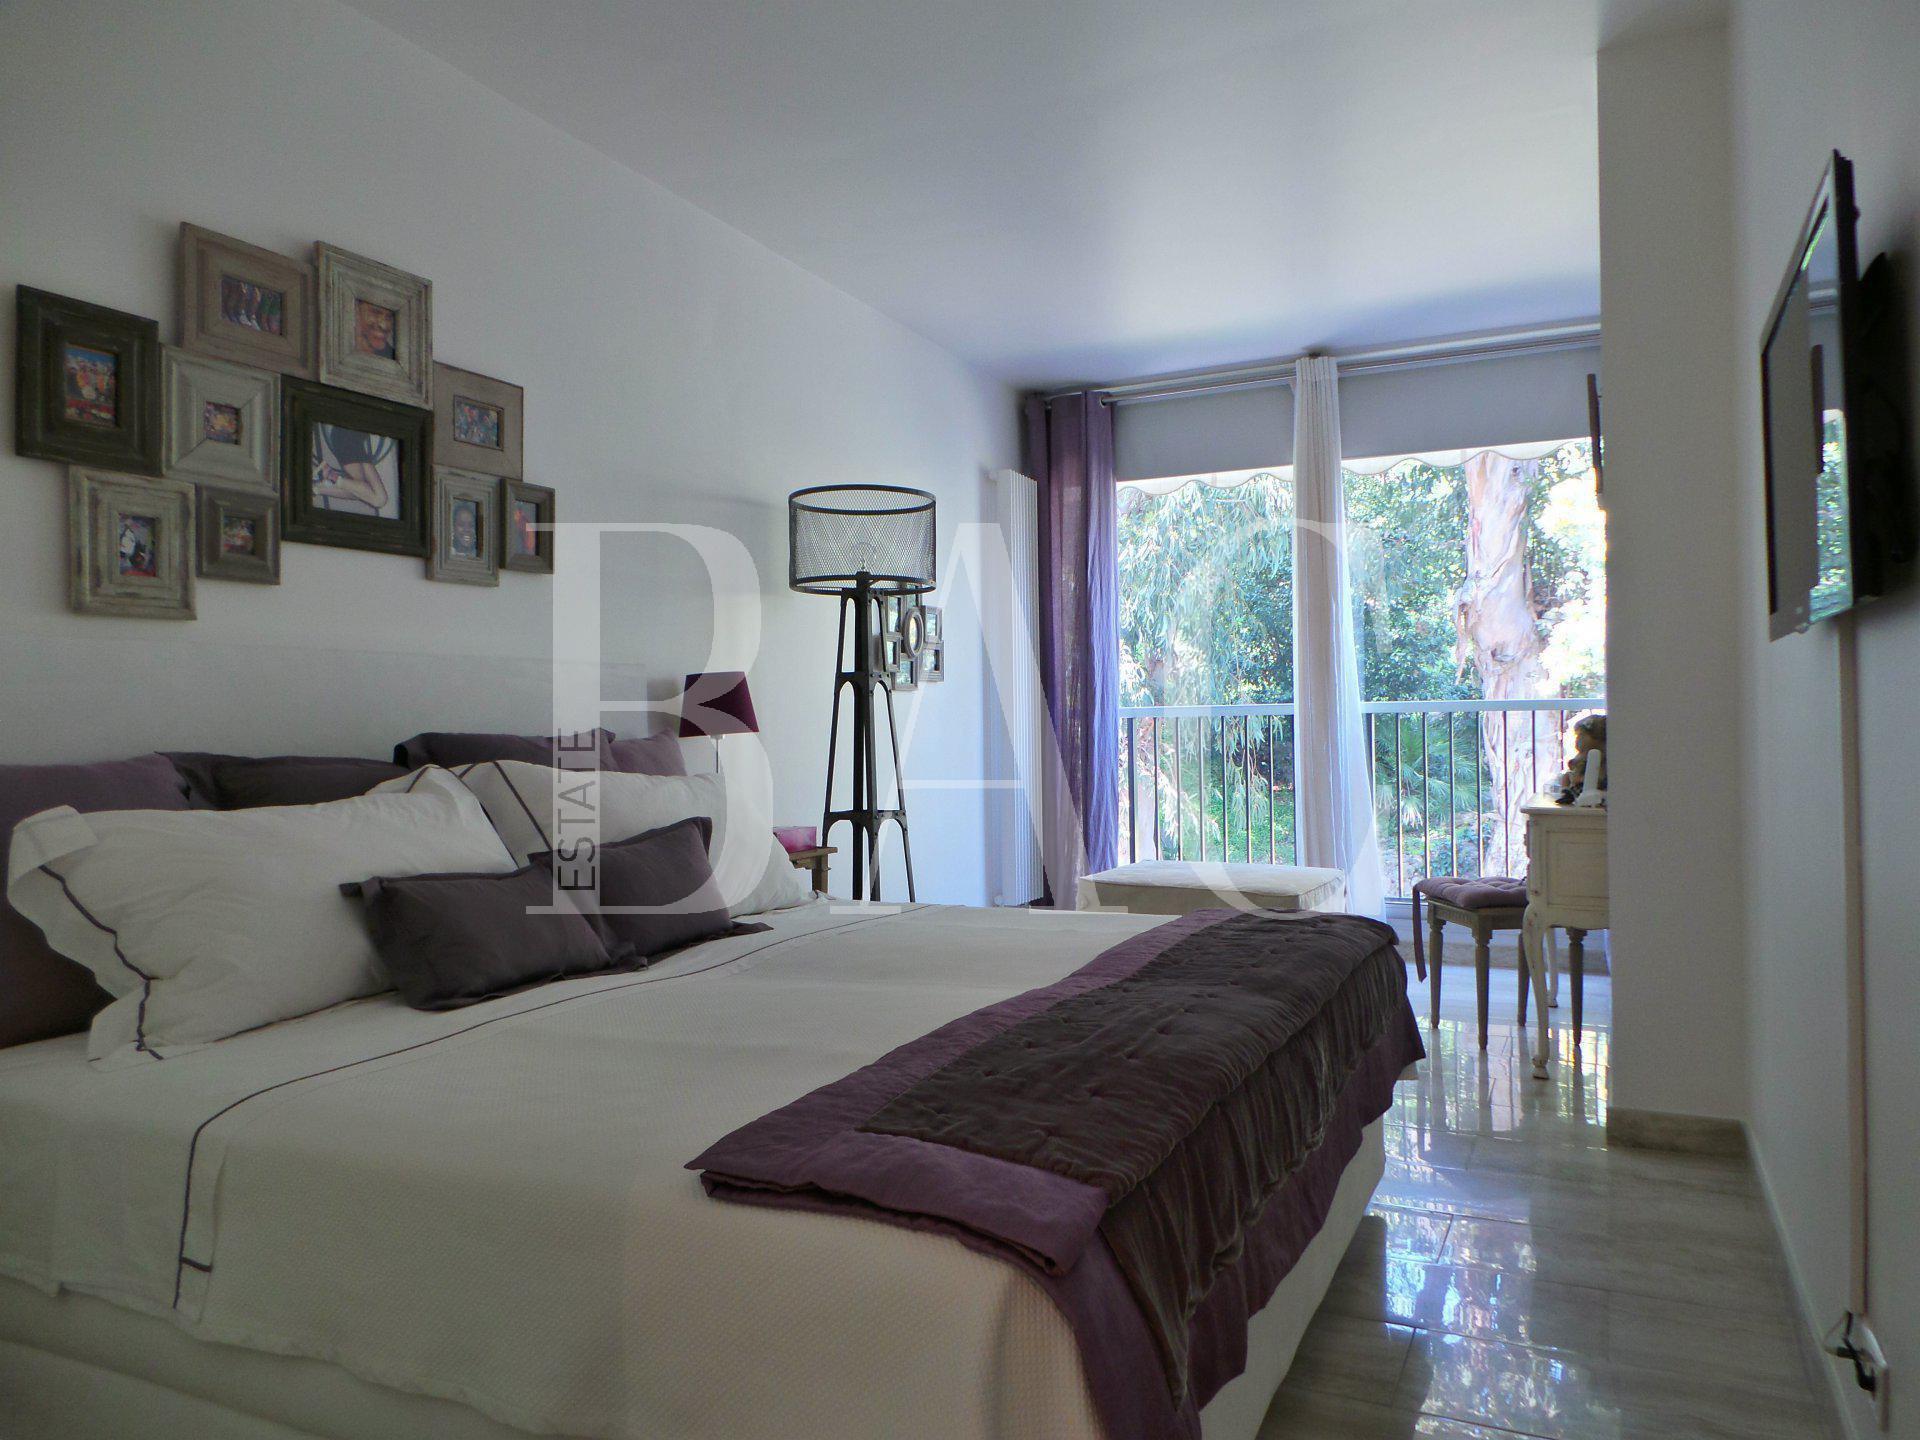 Superbe appartement à 600 mètres de la mer